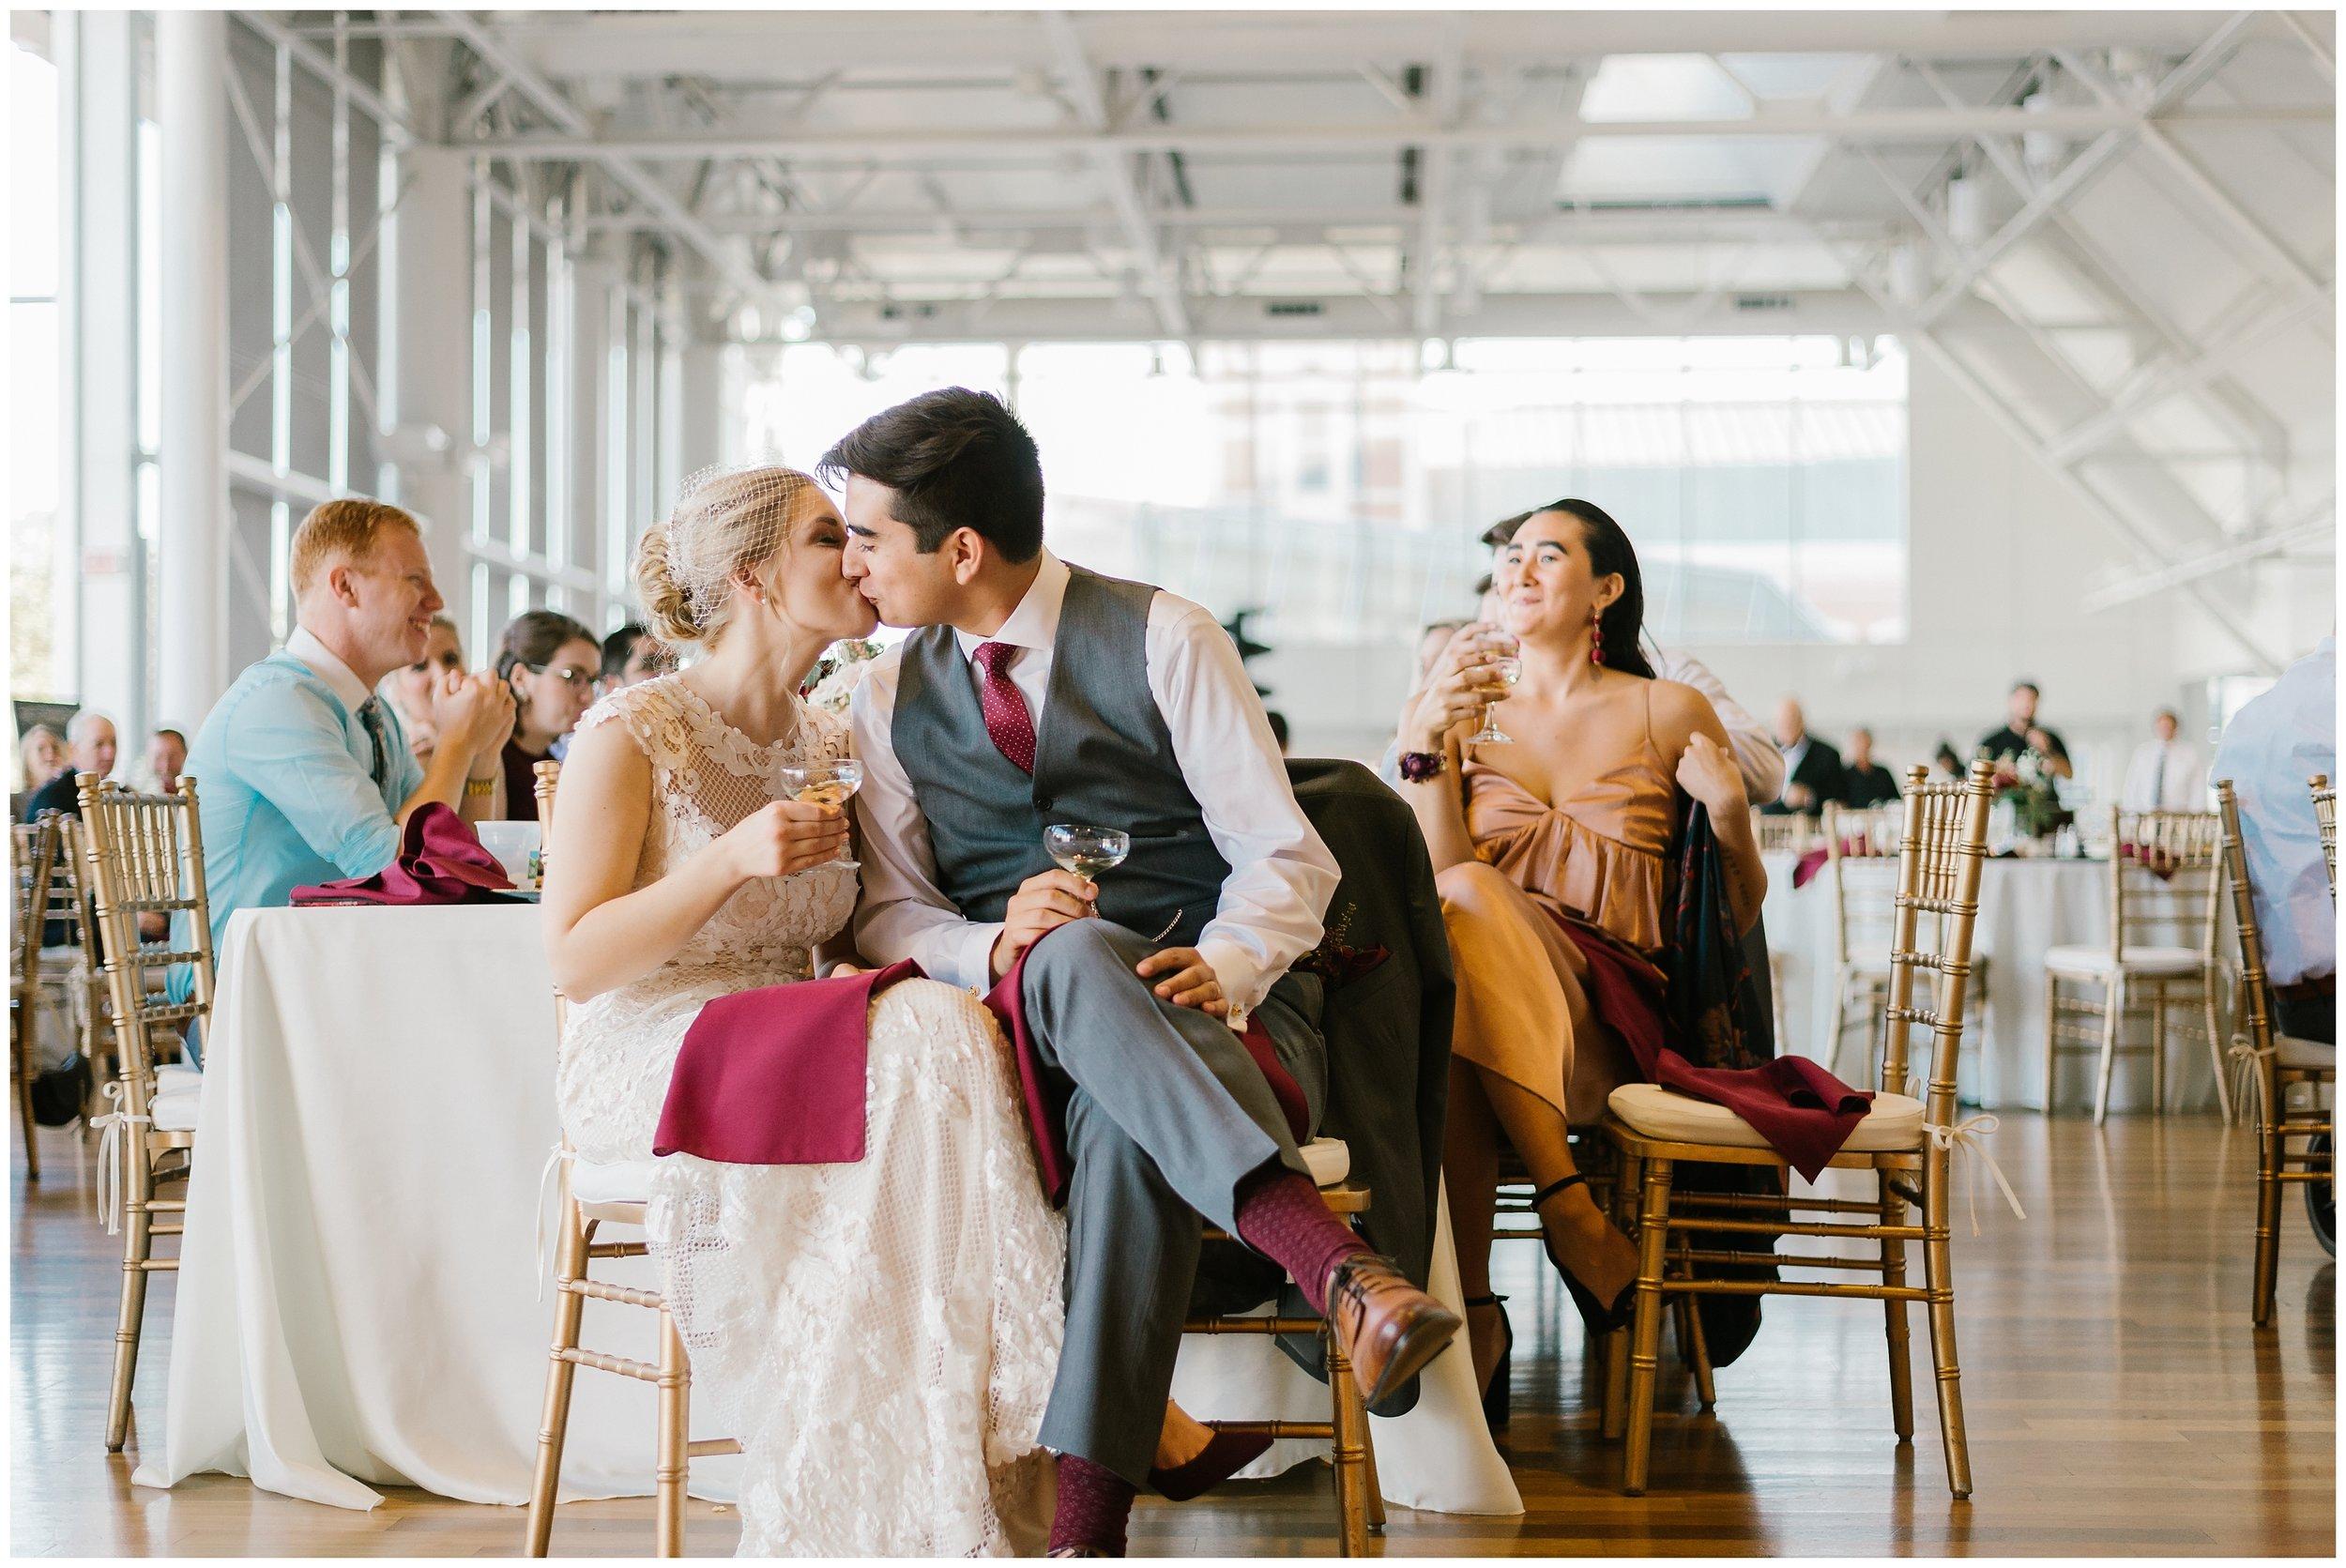 Rebecca_Shehorn_Photography_Indianapolis_Wedding_Photographer_7364.jpg